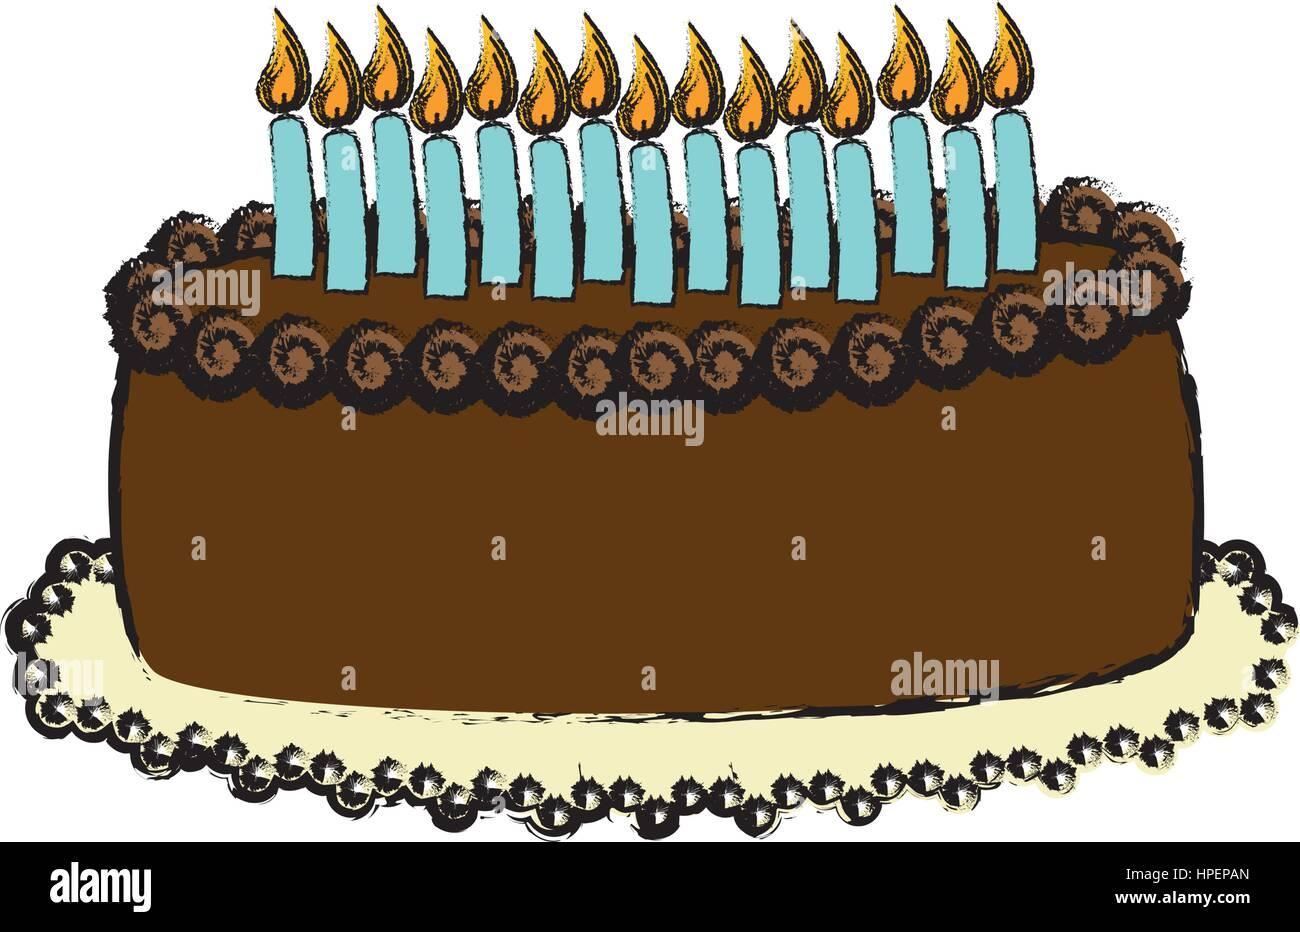 Delicious Birthday Cake Stock Vector Art Illustration